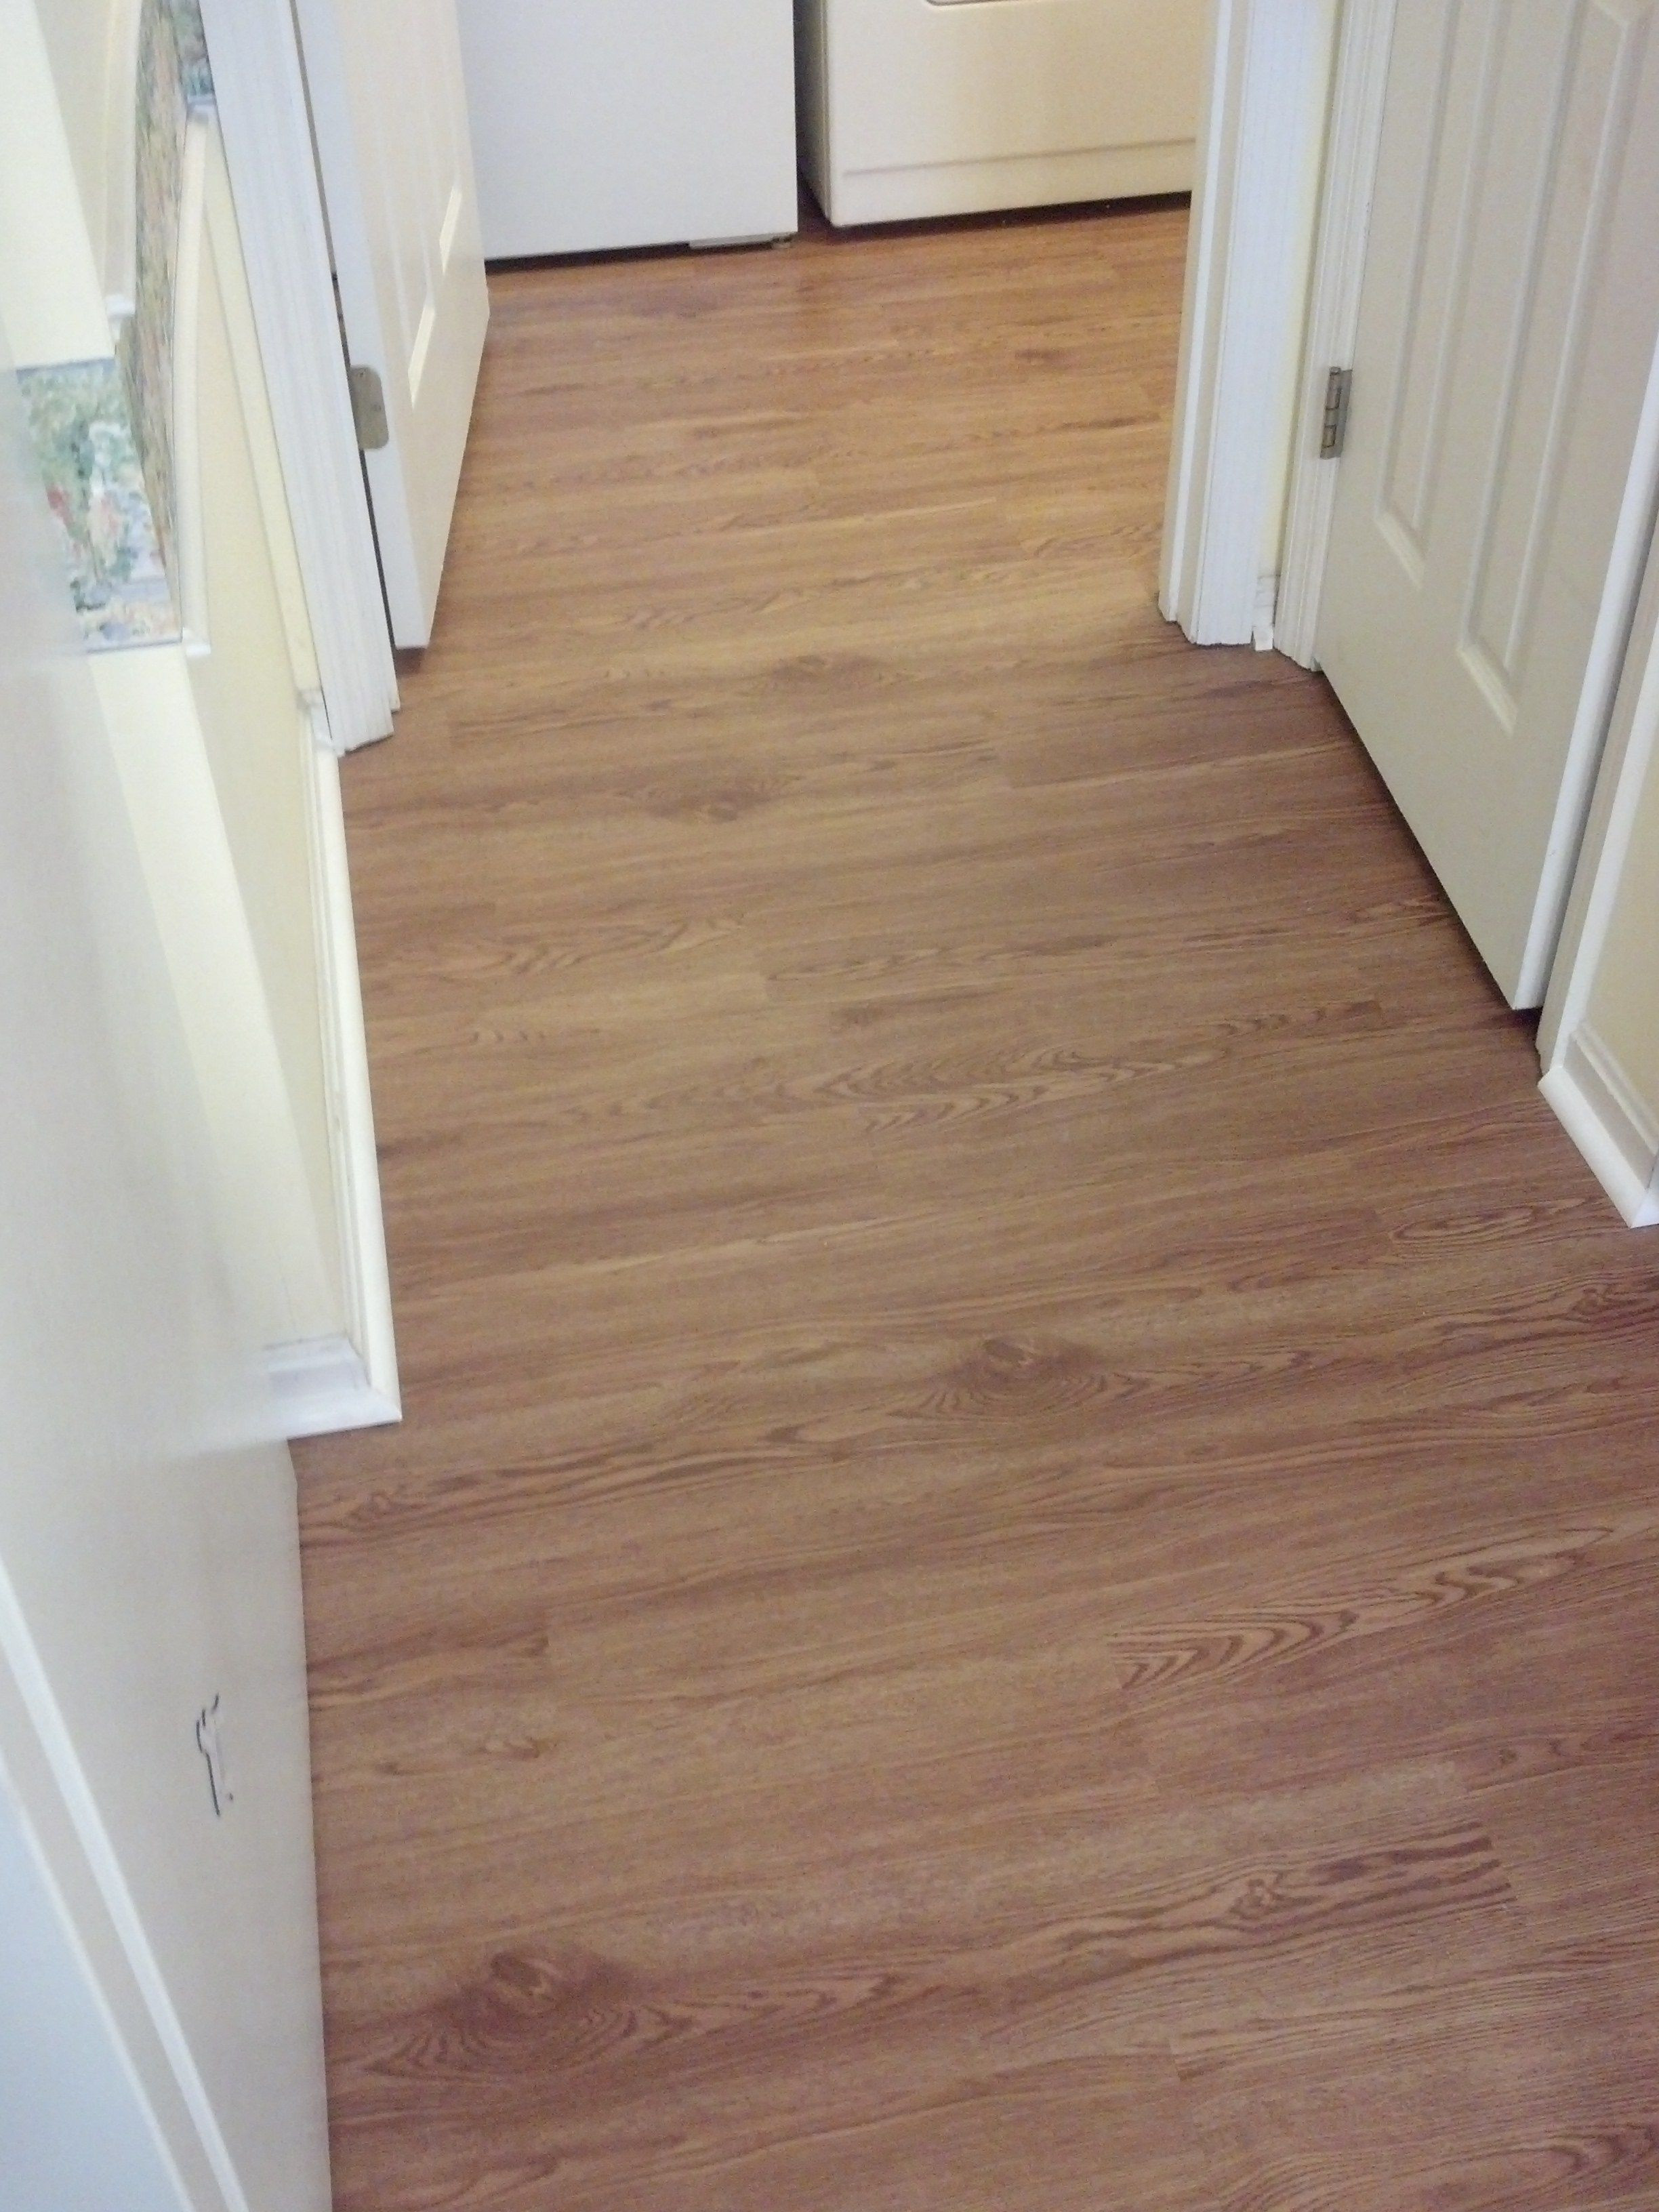 how to install hardwood floor in basement of luxury vinyl plank flooring made by earthwerks and sold and within luxury vinyl plank flooring made by earthwerks and sold and installed by http